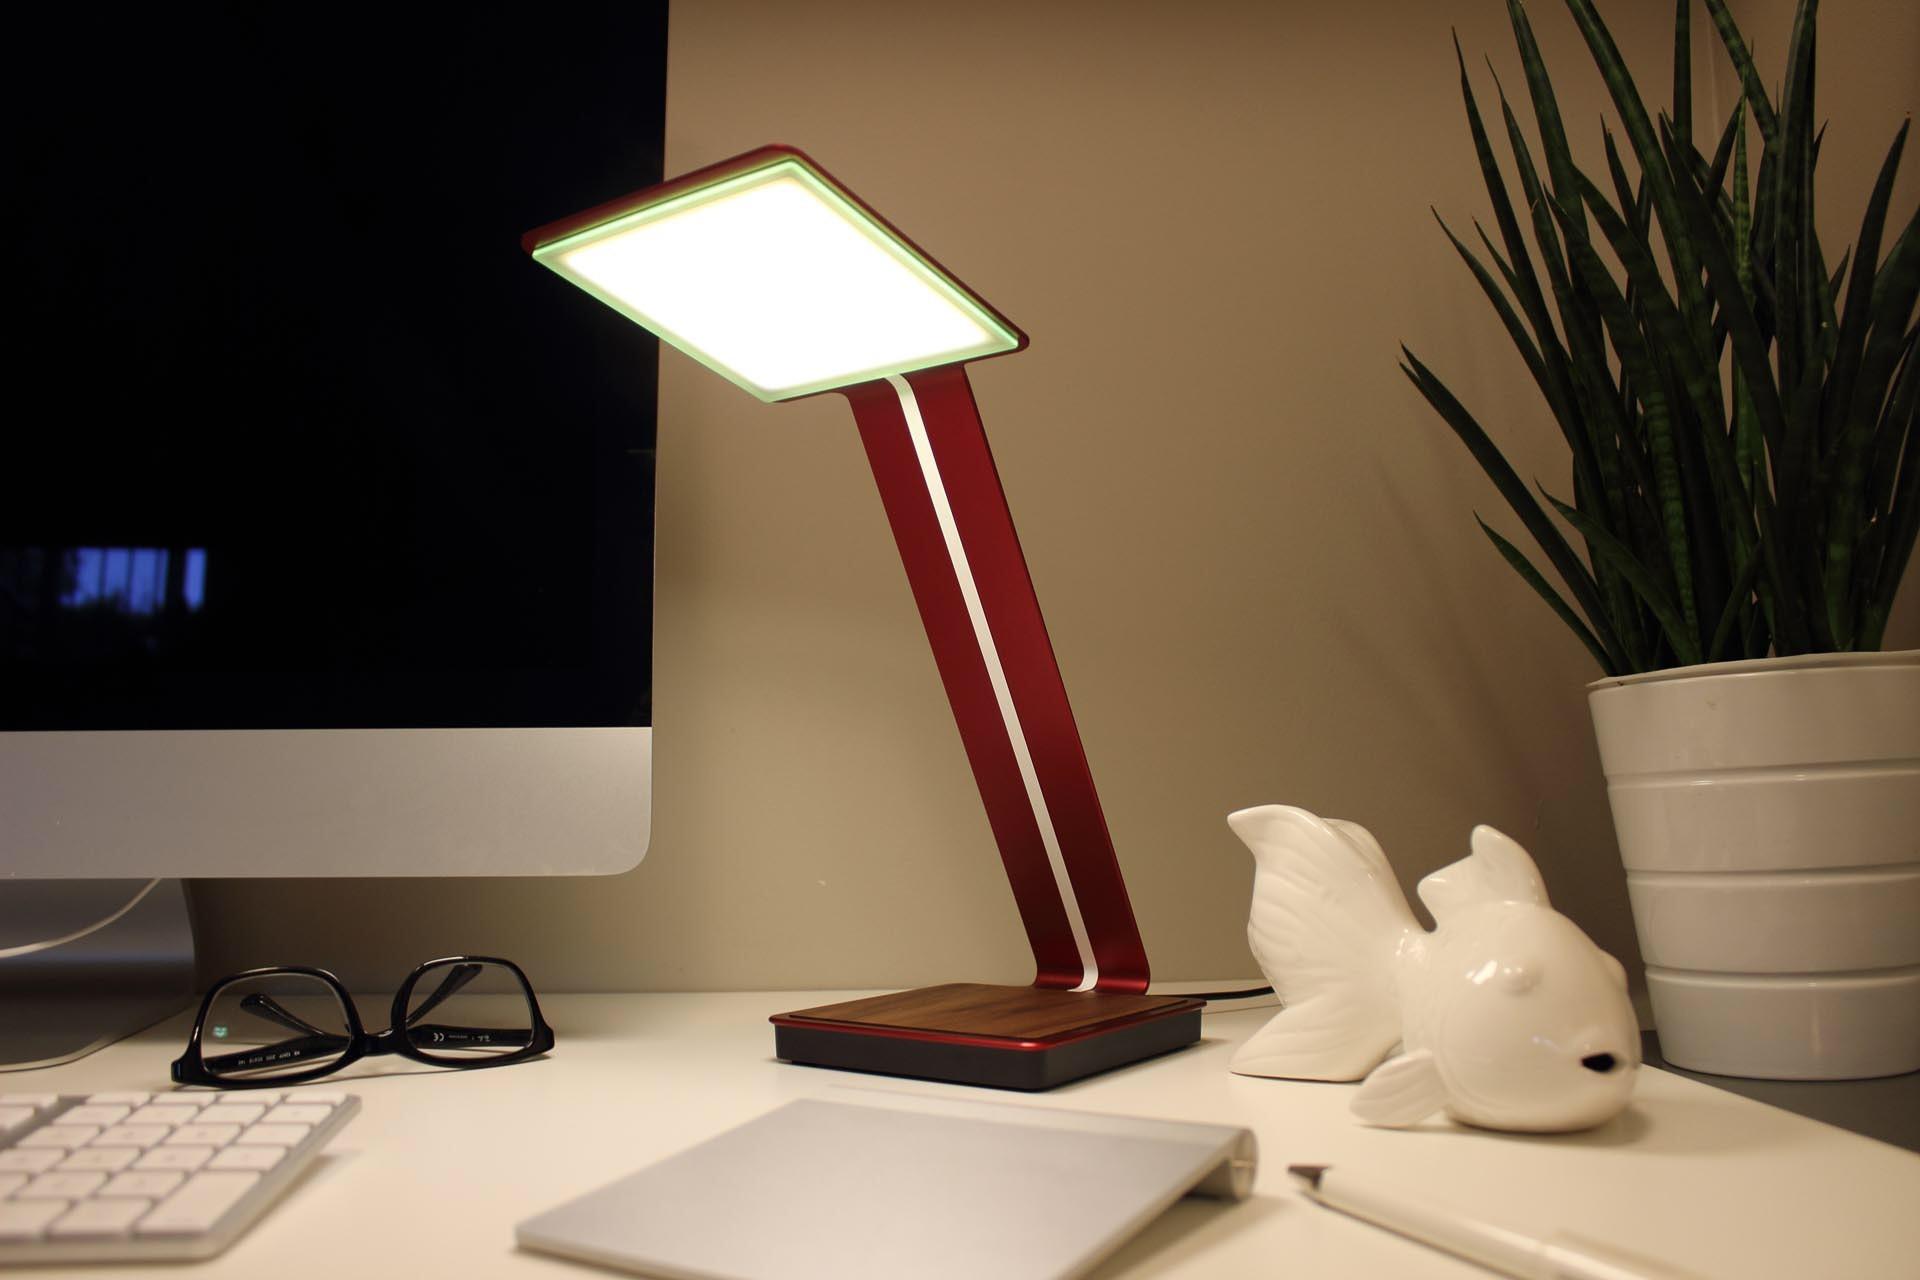 Aerelight A1 OLED desk lamp. ($299)